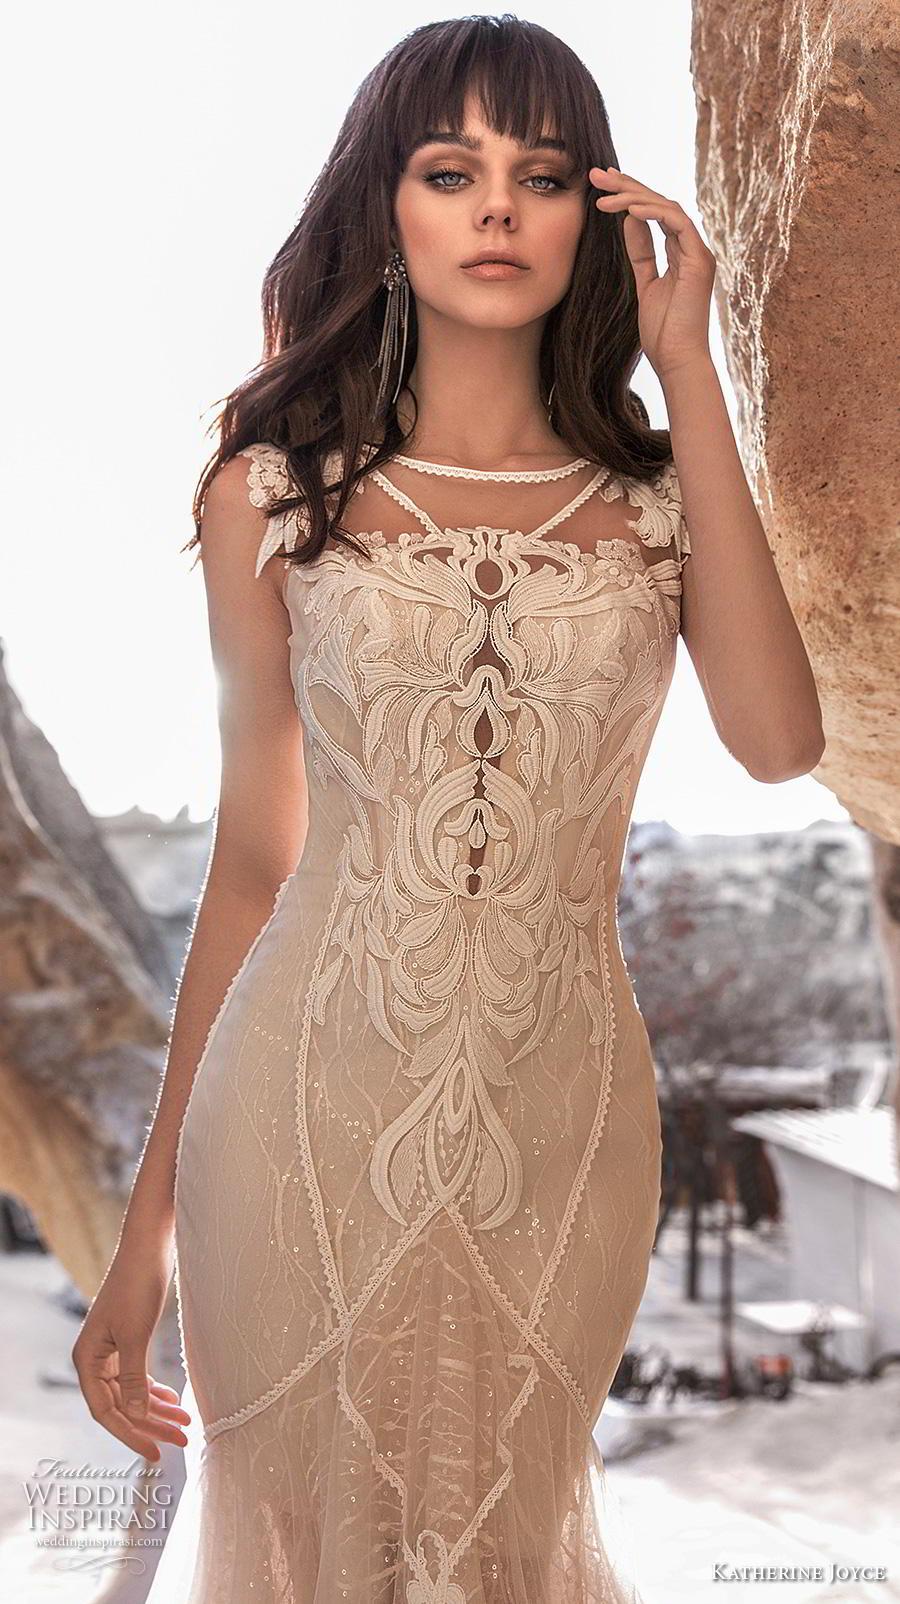 katherine joyce 2020 bridal cap sleeves bateau neckline full embellishment elegant fit and flare wedding dress sheer button low back chapel train (14) zv